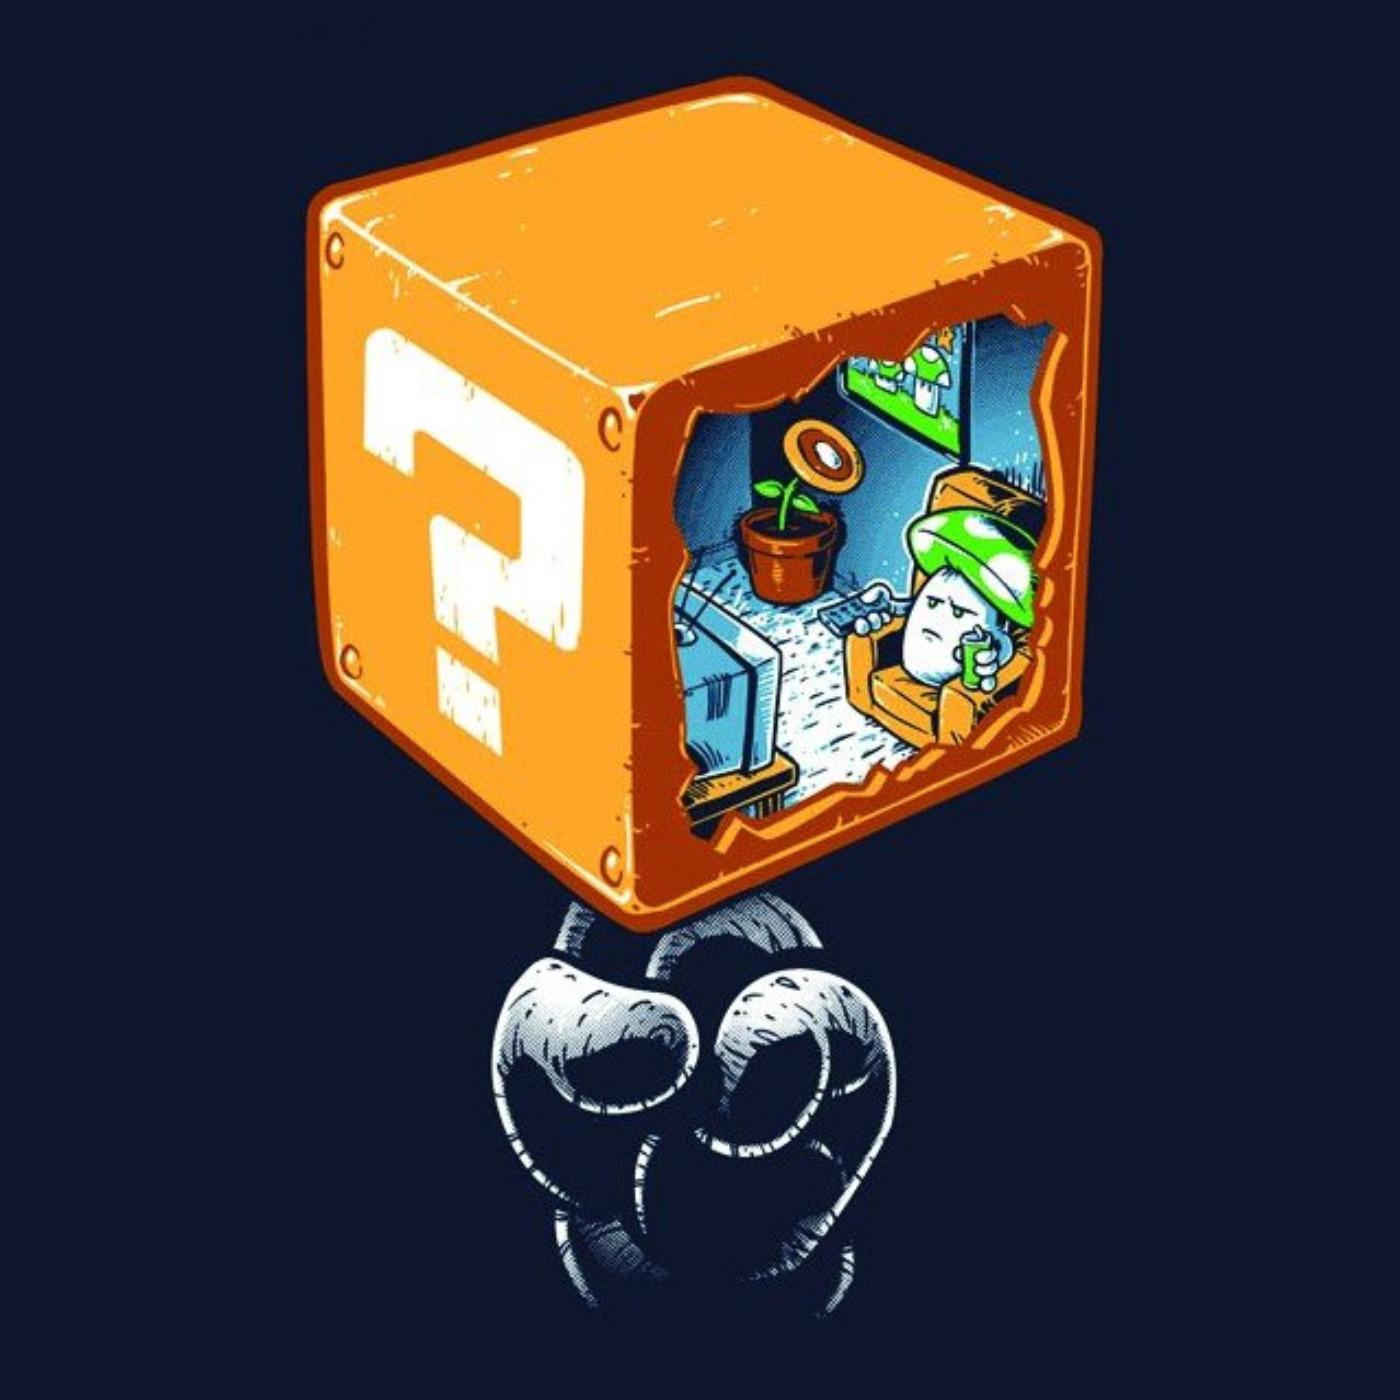 Level 1: The Kushroom Mingdom